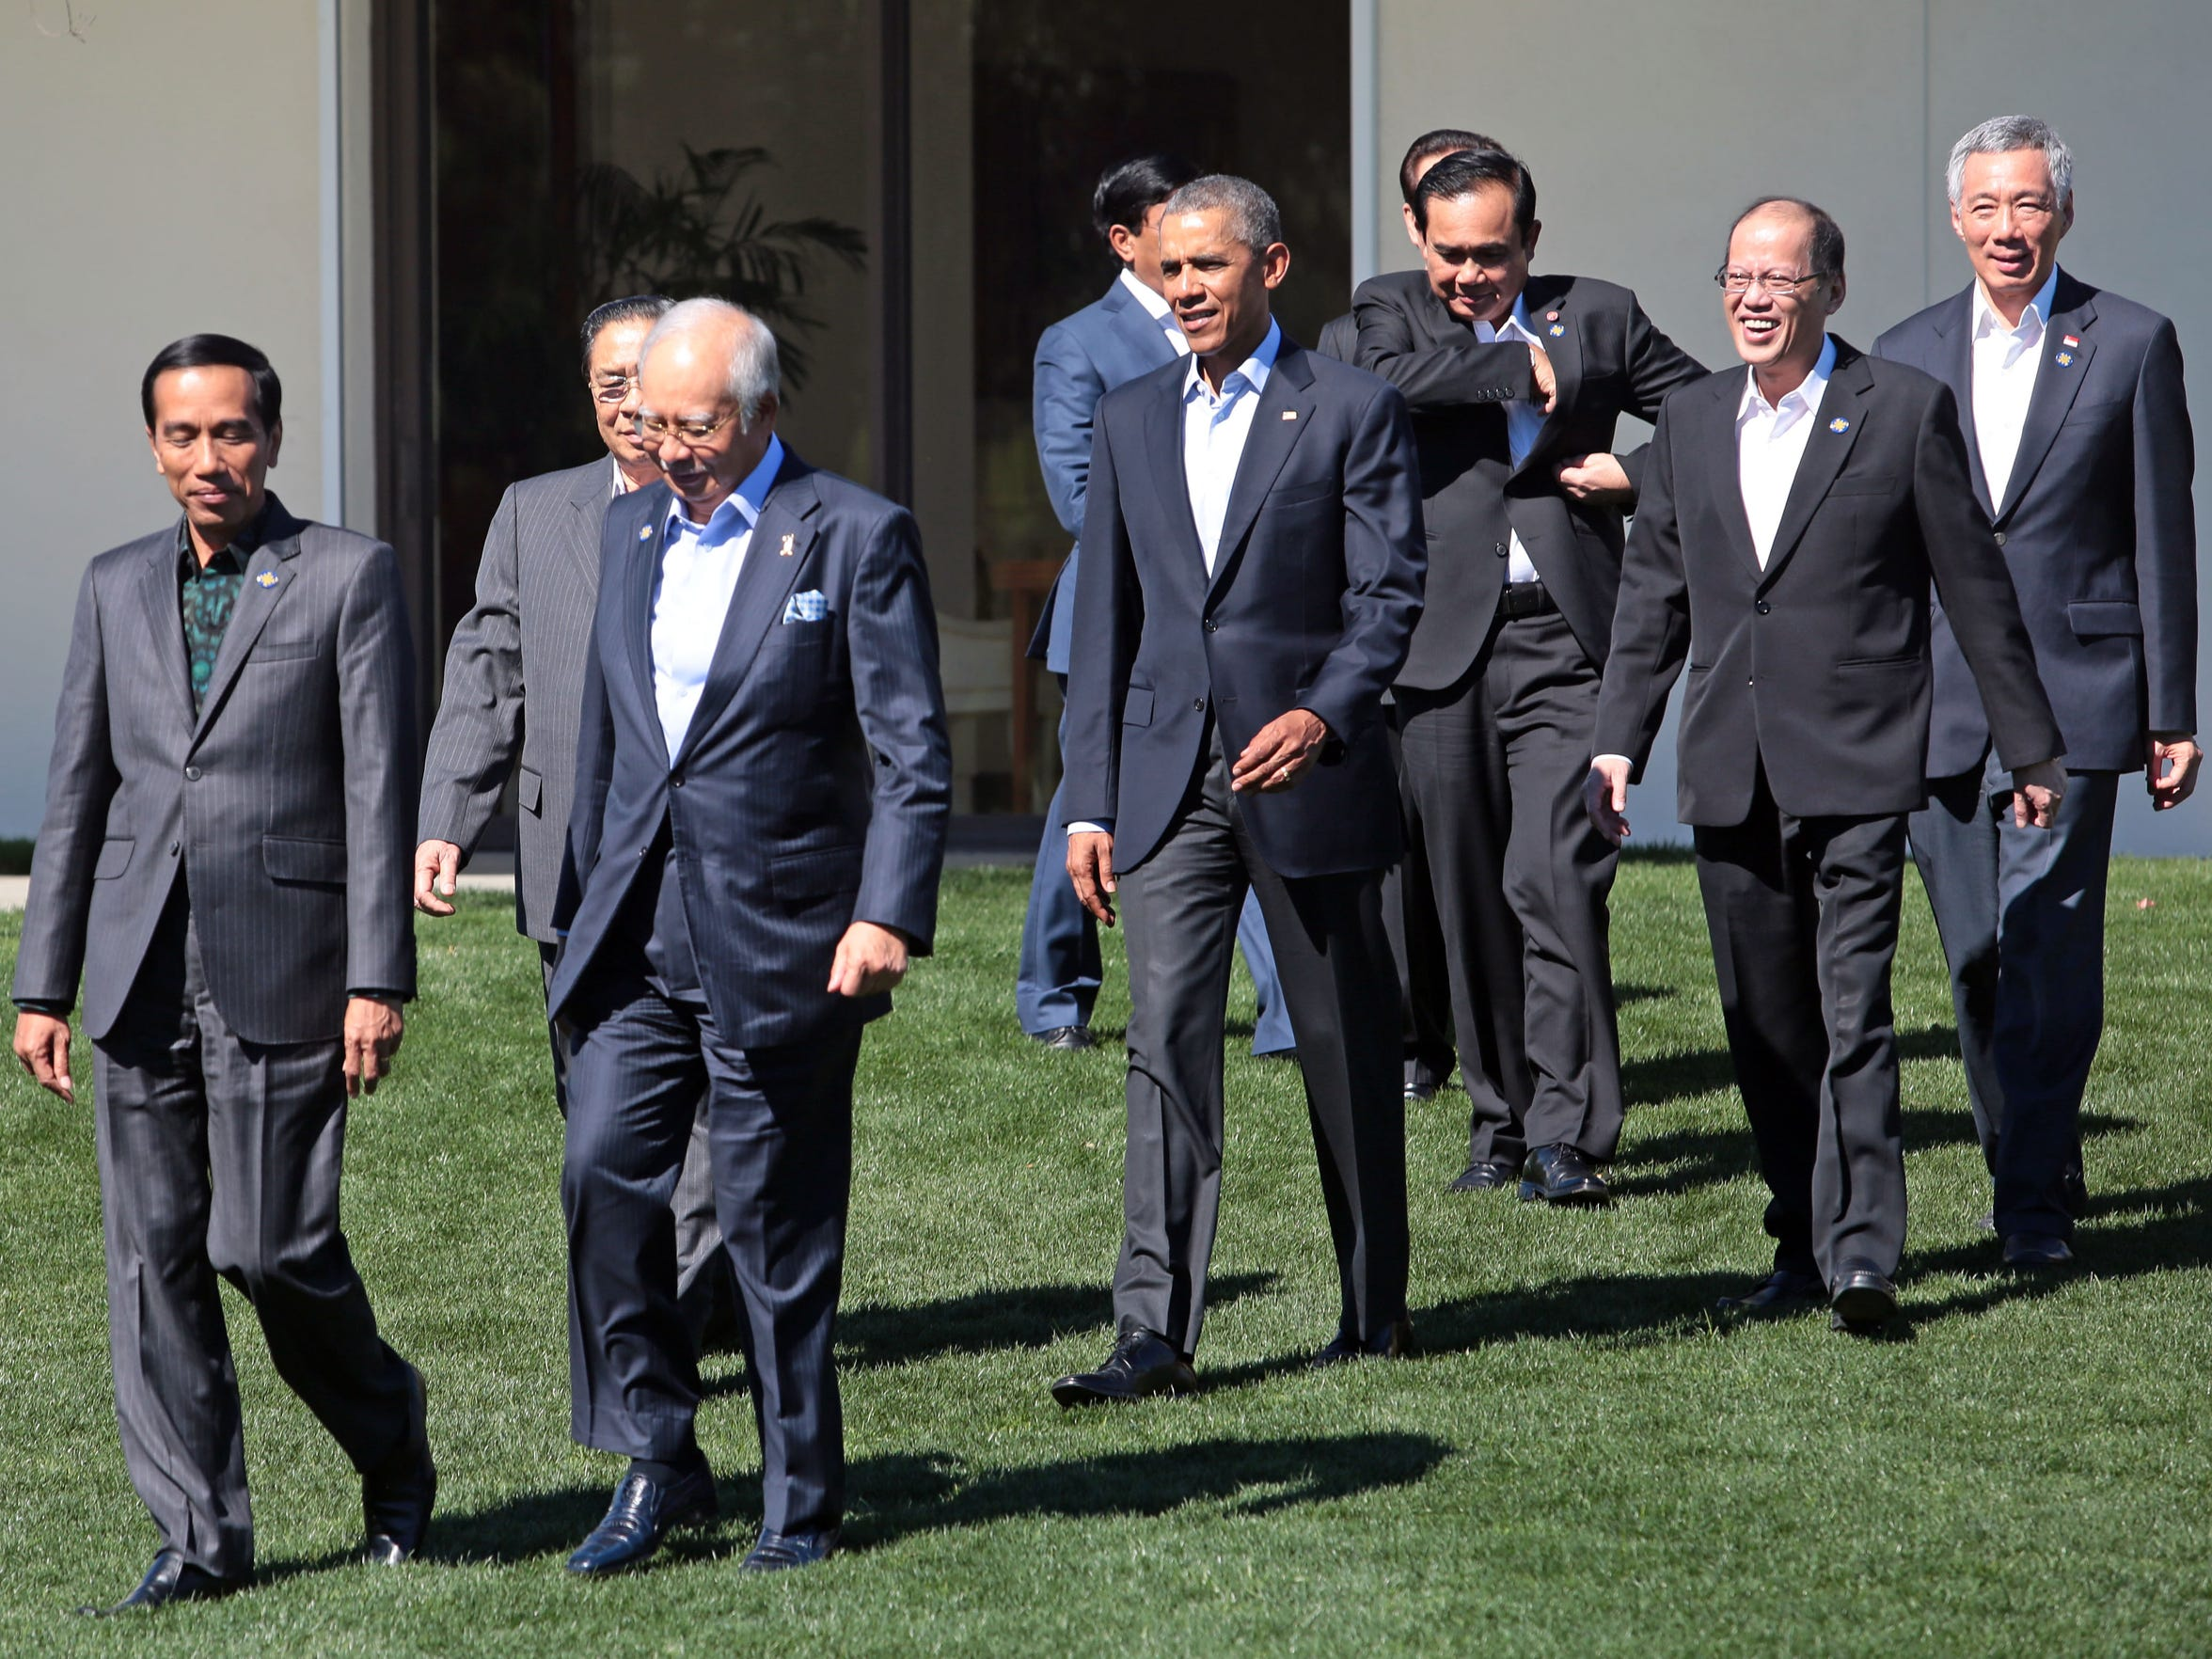 President Barack Obama walks with leaders of ASEAN